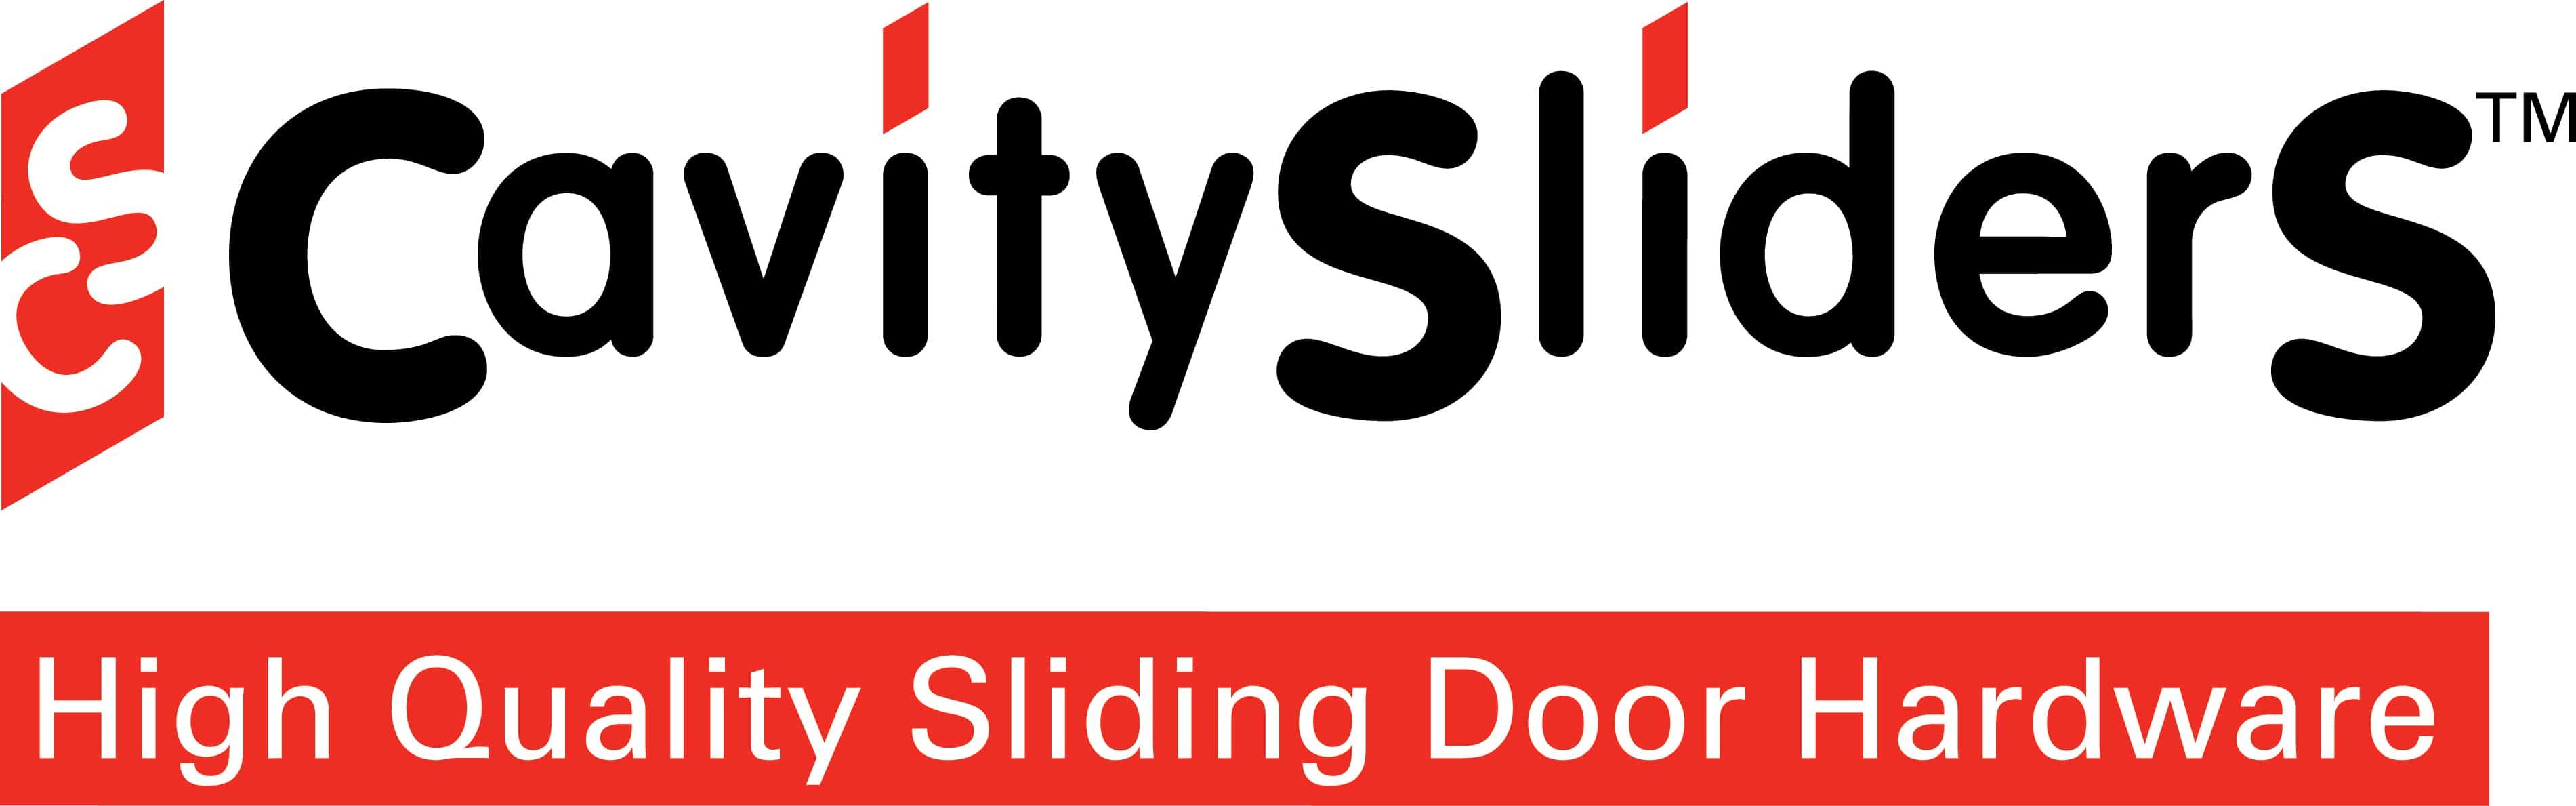 Cavity Sliders High Quality Sliding Door Hardware